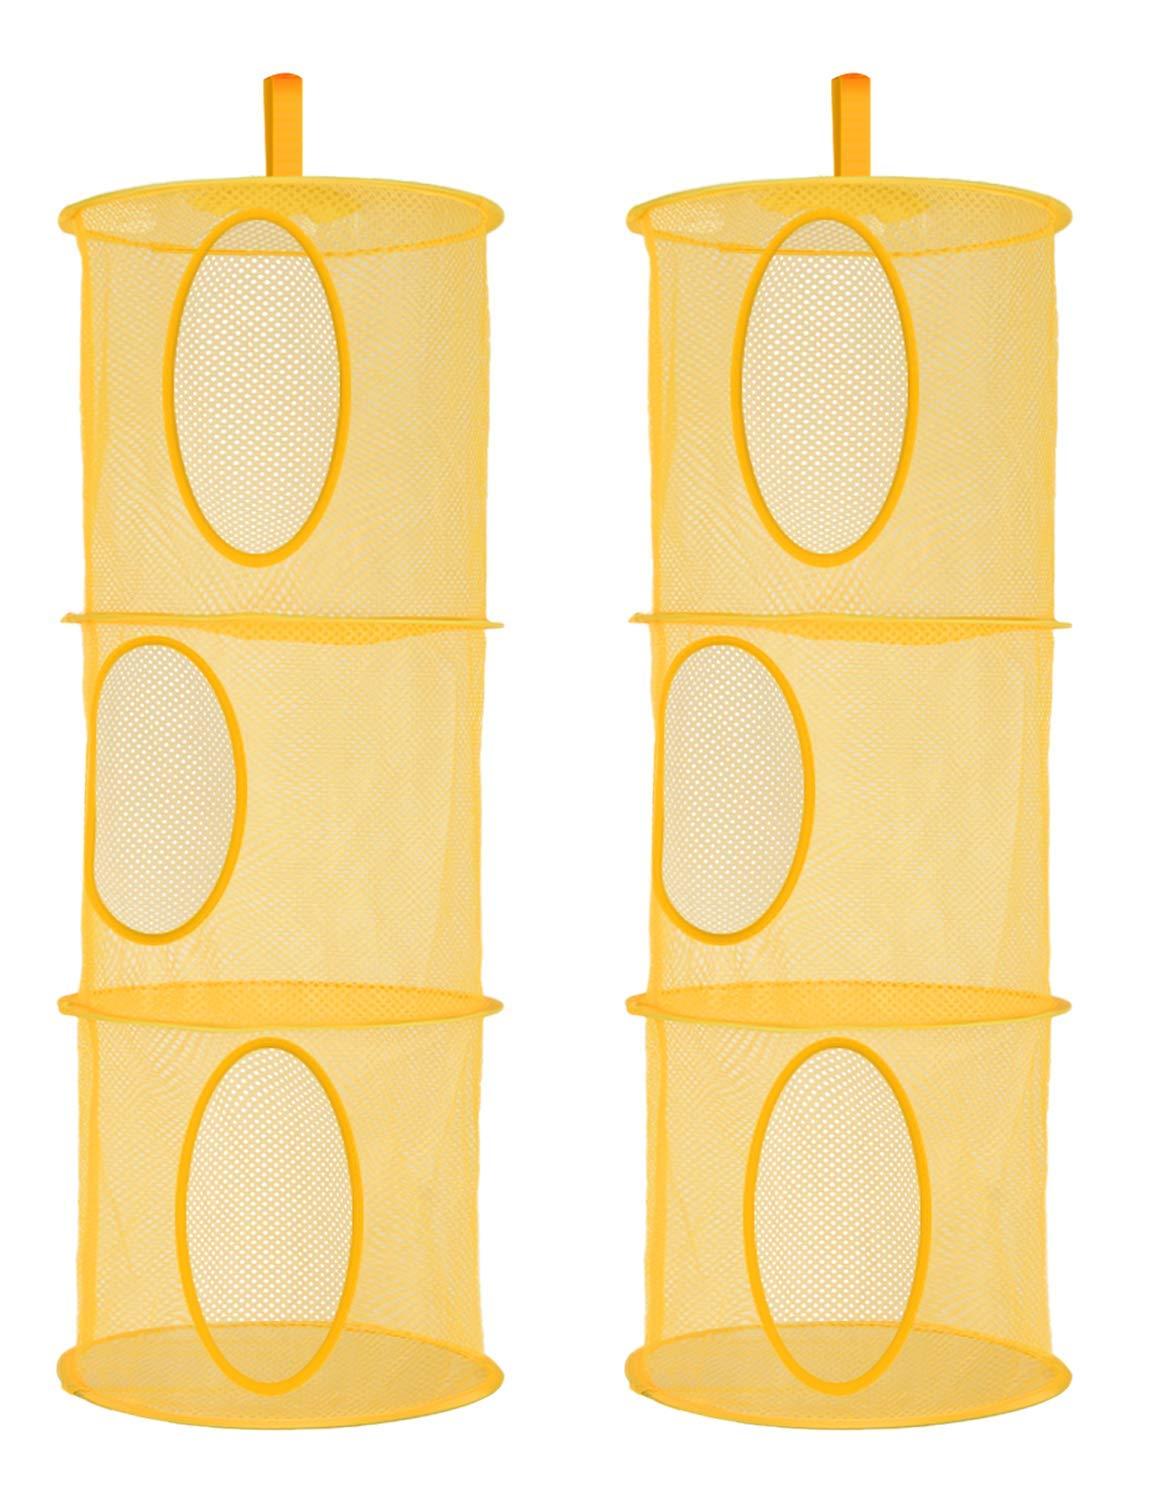 Libeder Mesh Hanging Storage Space Saver Bags Organizer,Foldable Storage Organizer 4 Compartments Toy Storage Basket for Kids Room Bathroom 2 Sets Blue